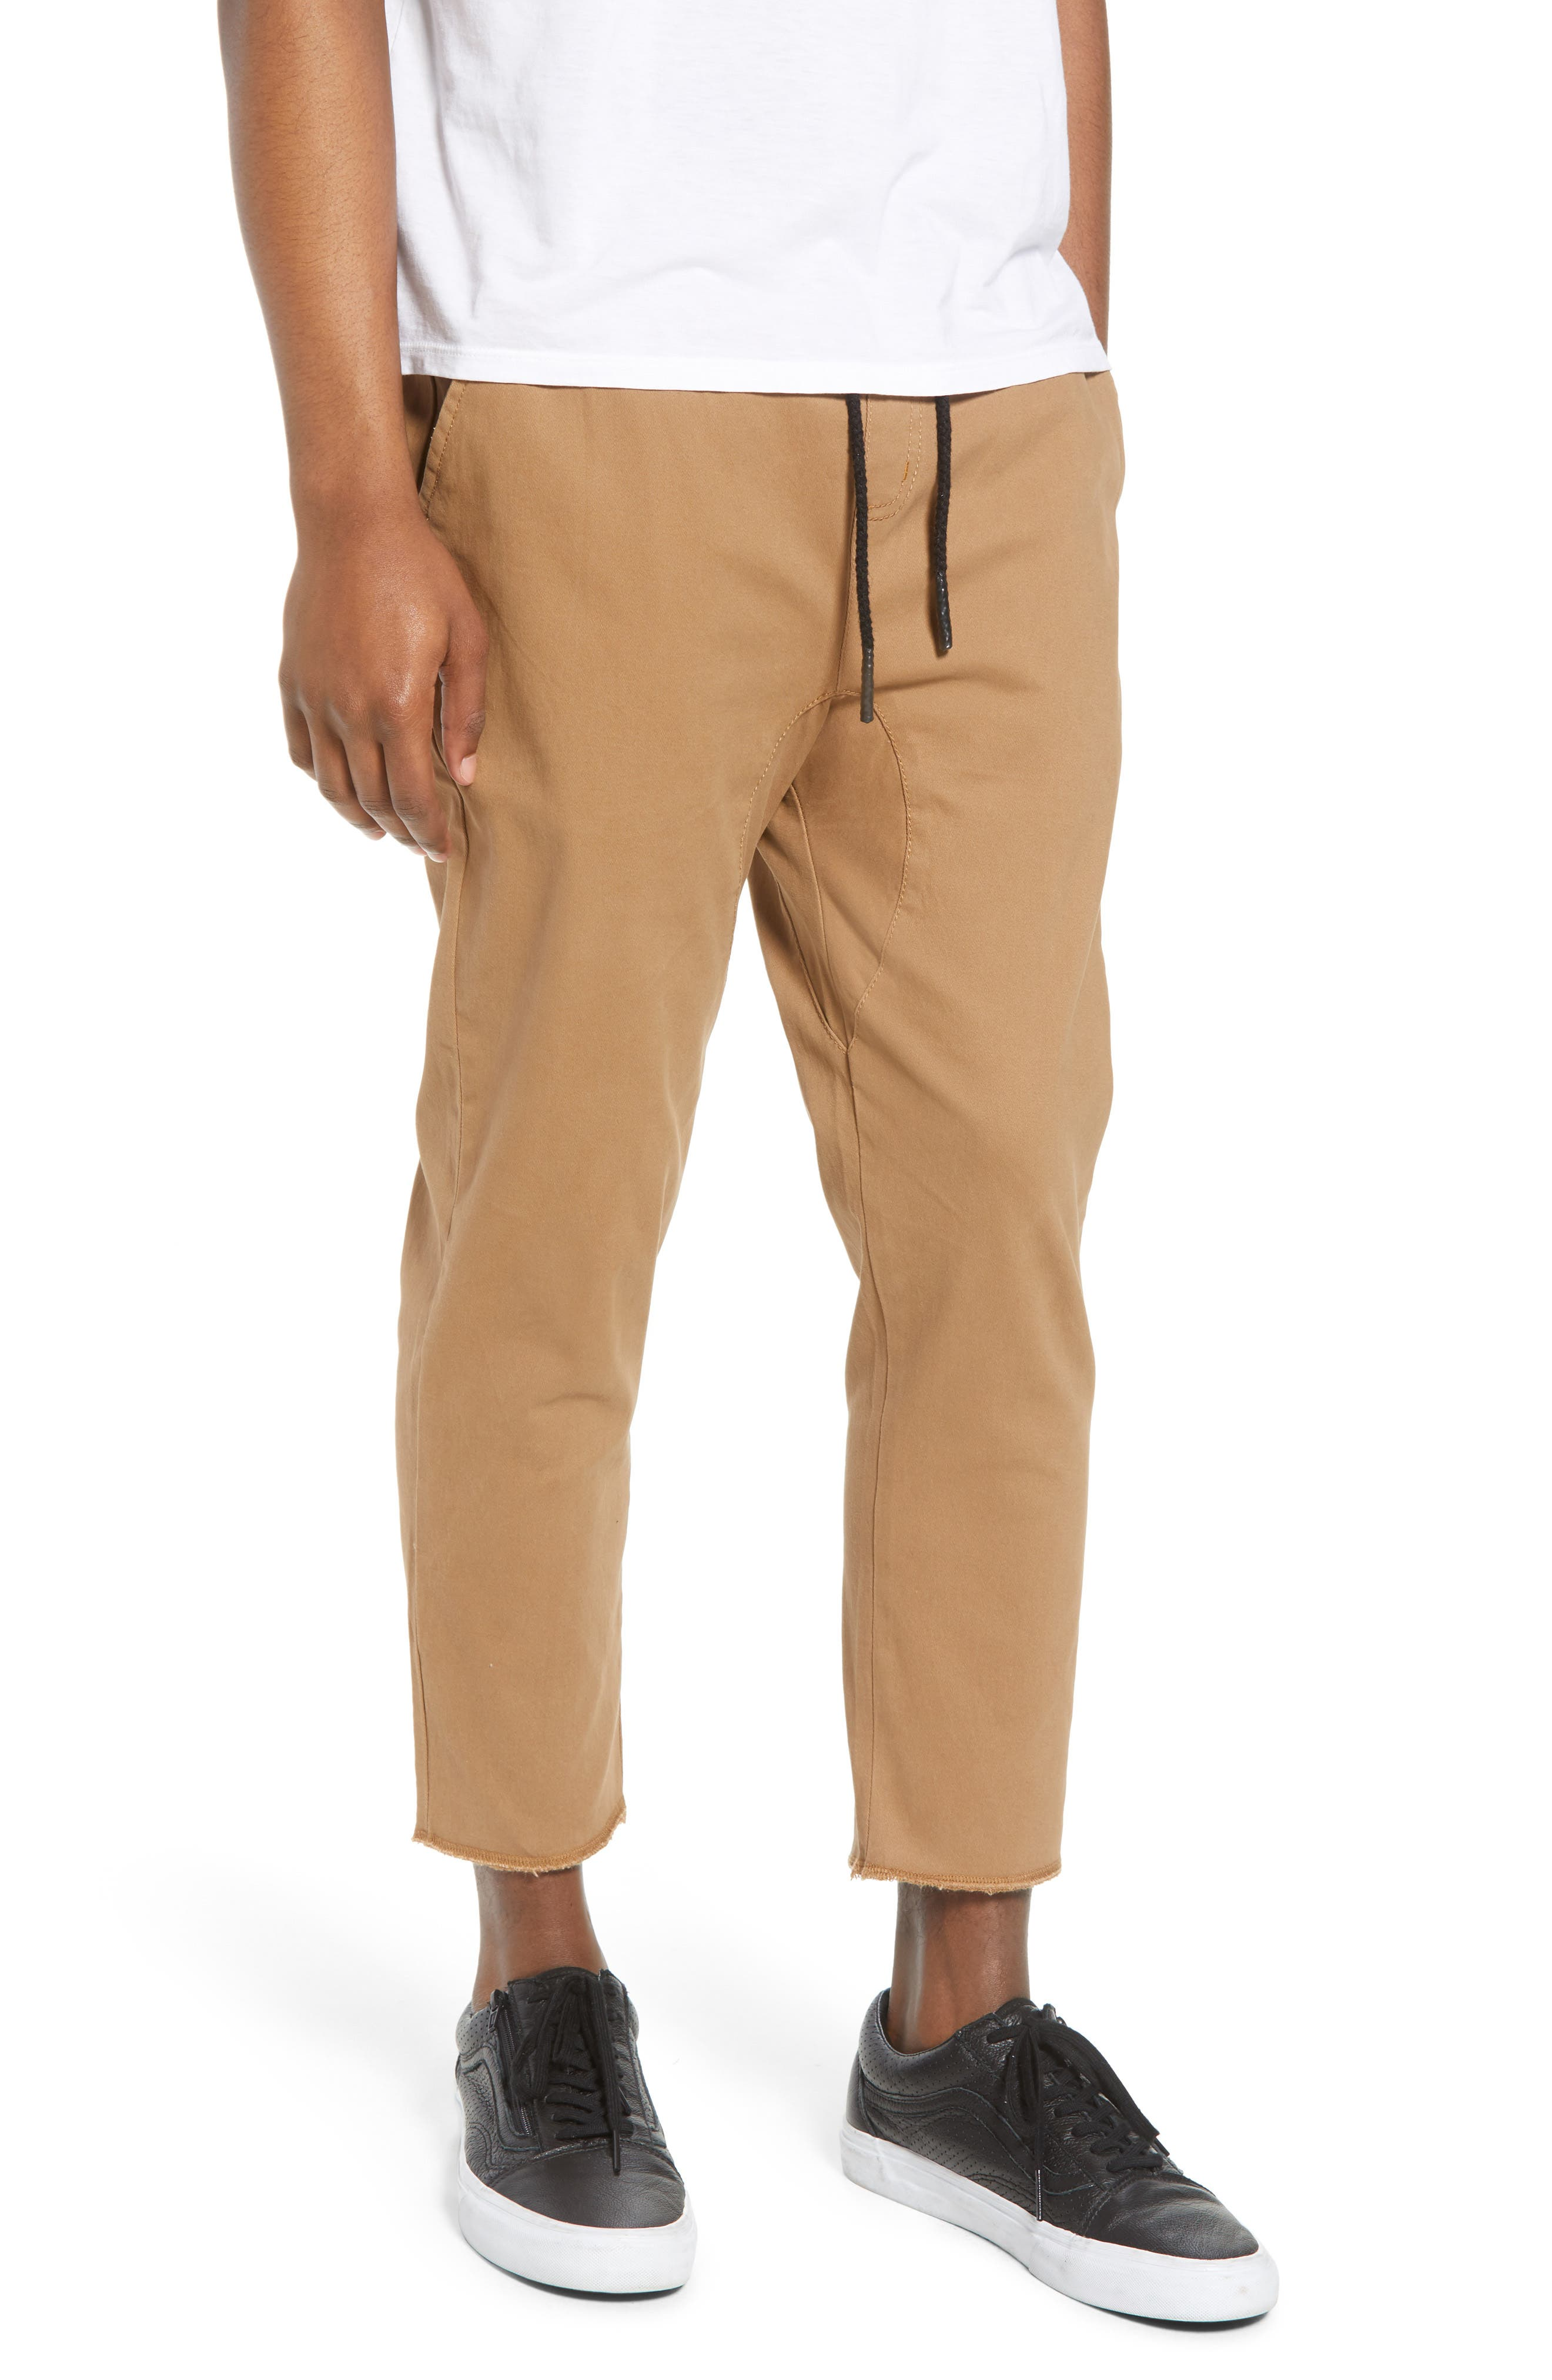 Vacation Slim Fit Crop Pants,                             Main thumbnail 1, color,                             KHAKI